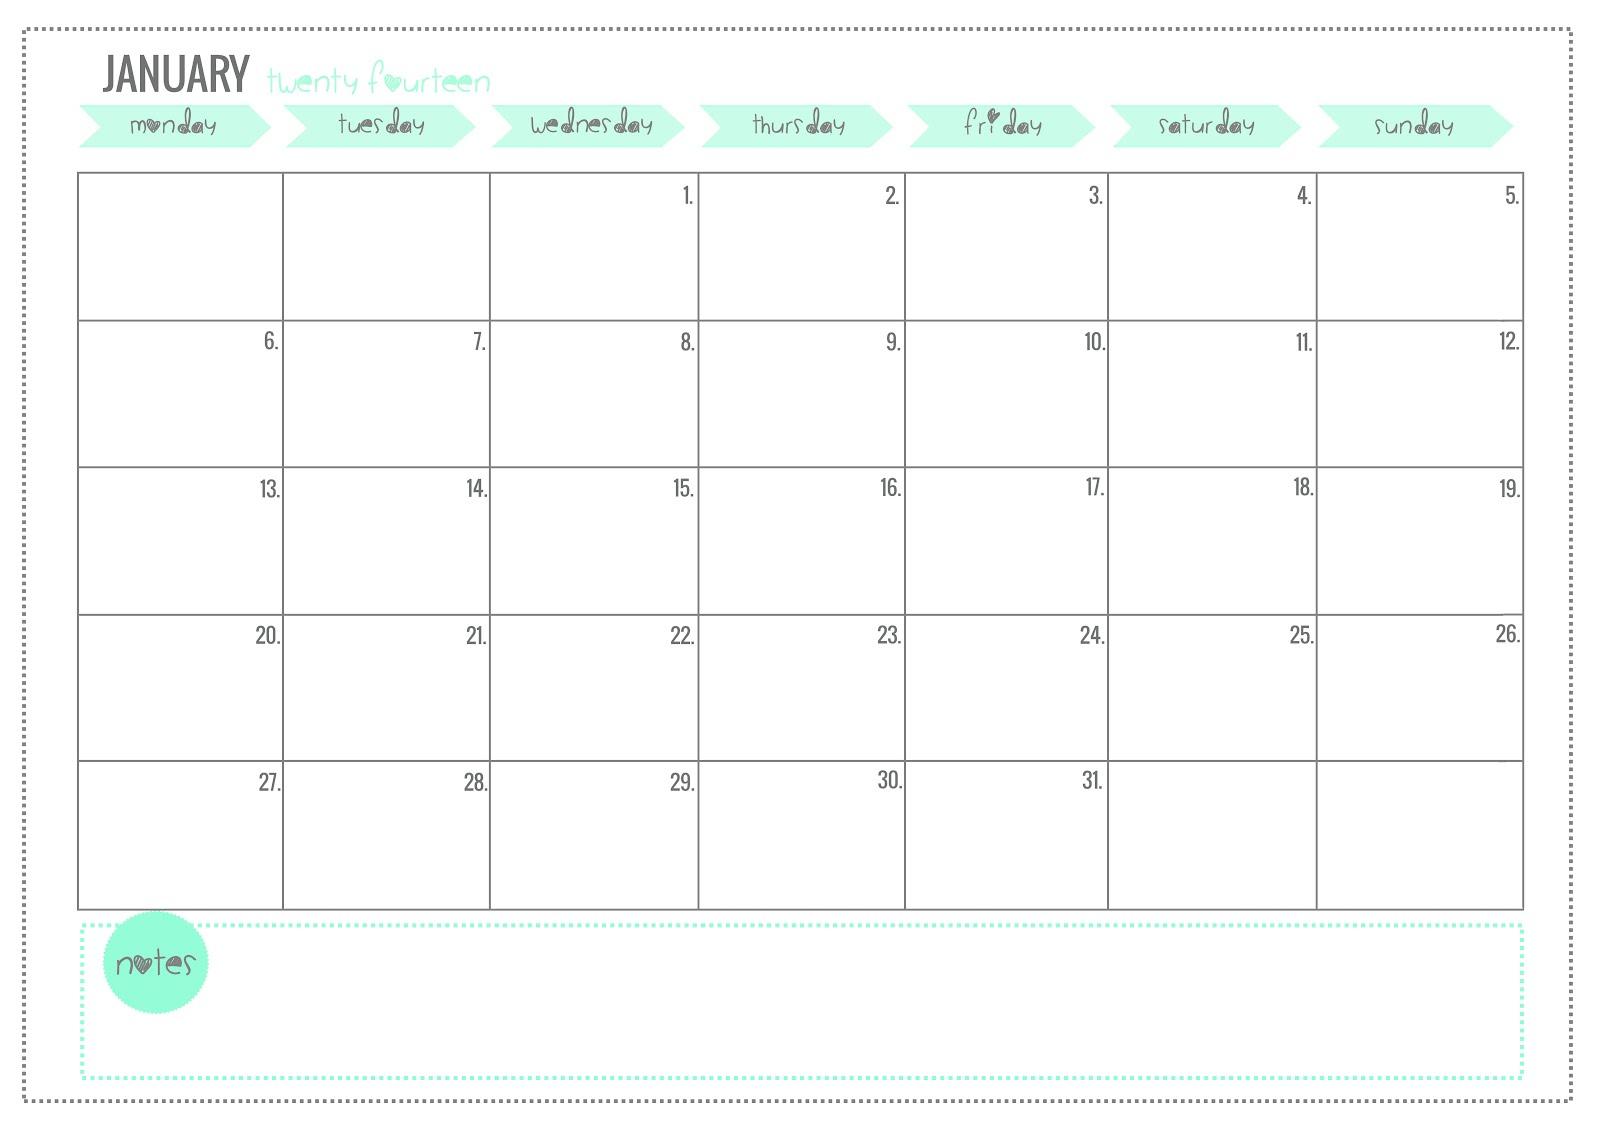 2014 Blogging Calendar